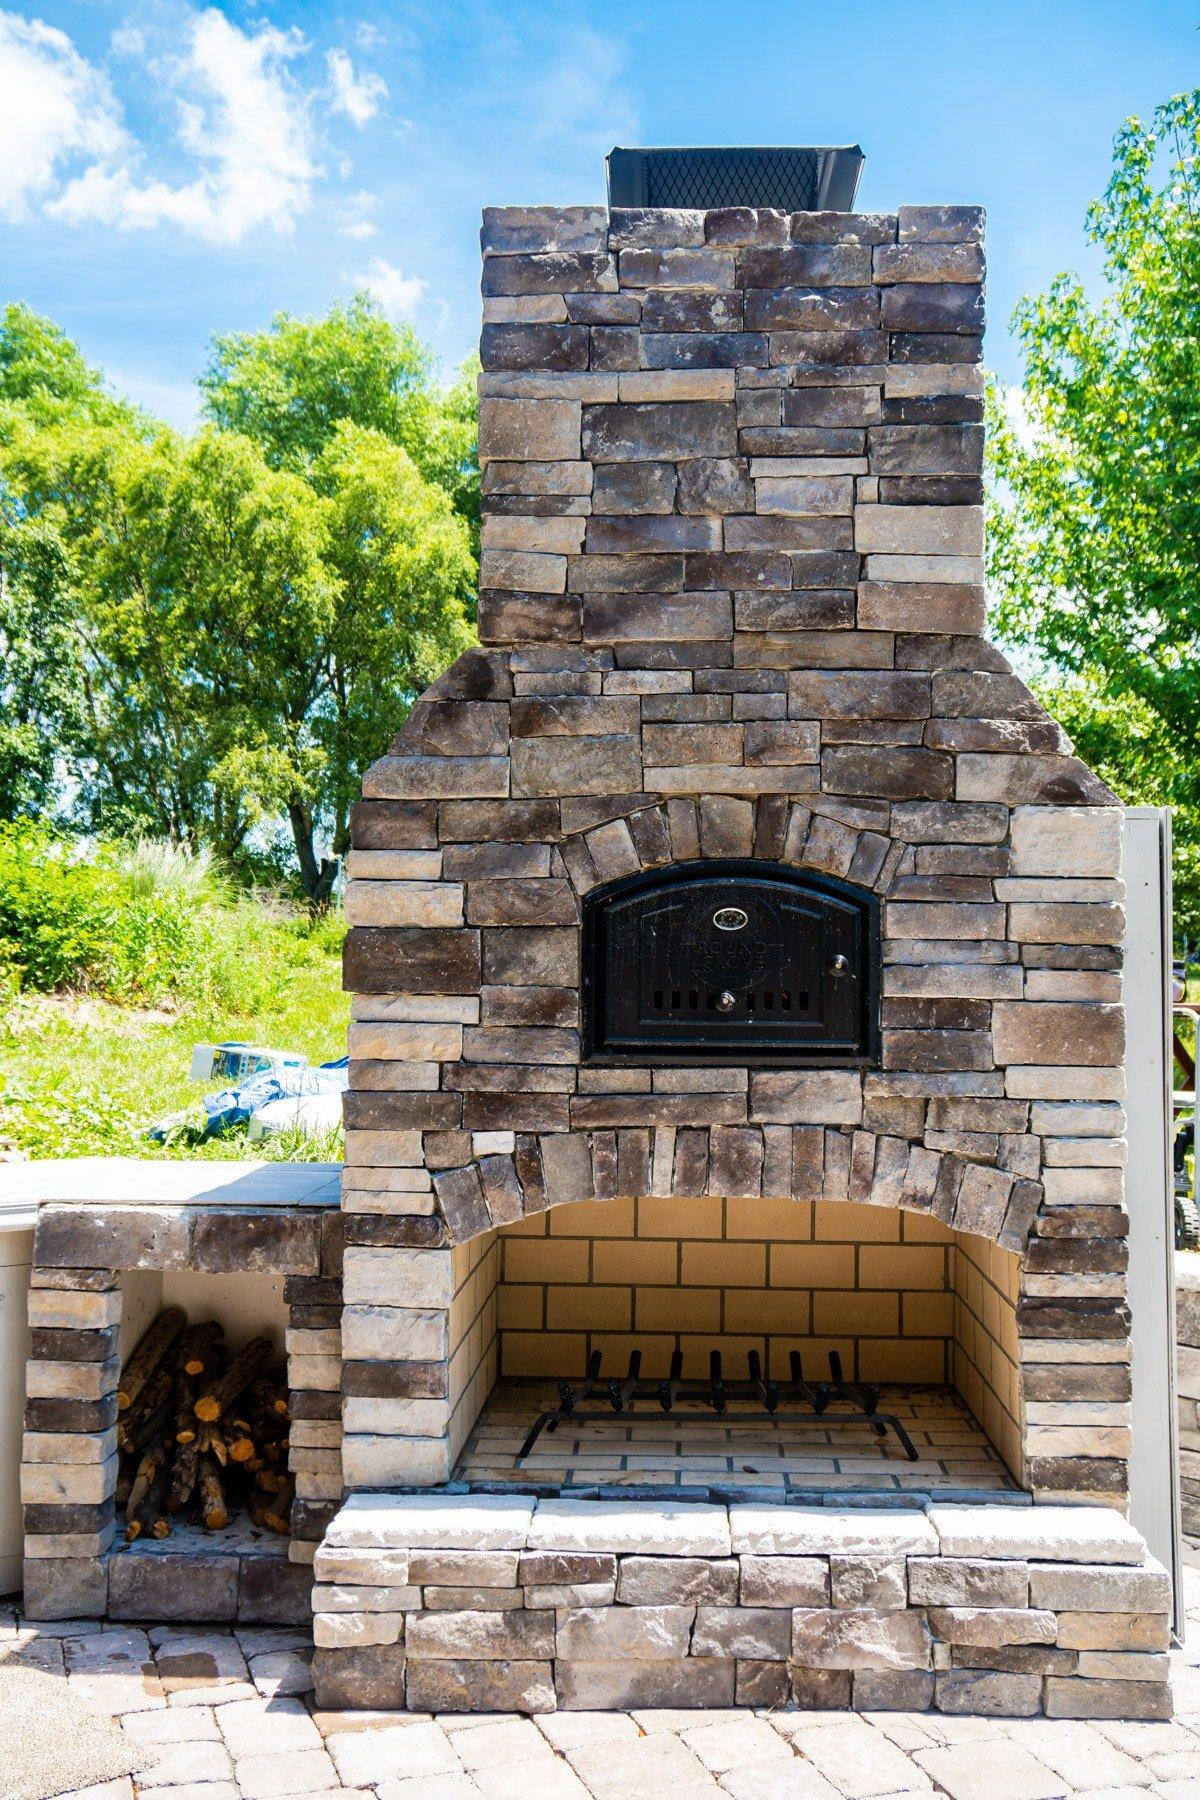 Stoned Round Grove outdoor brick oven